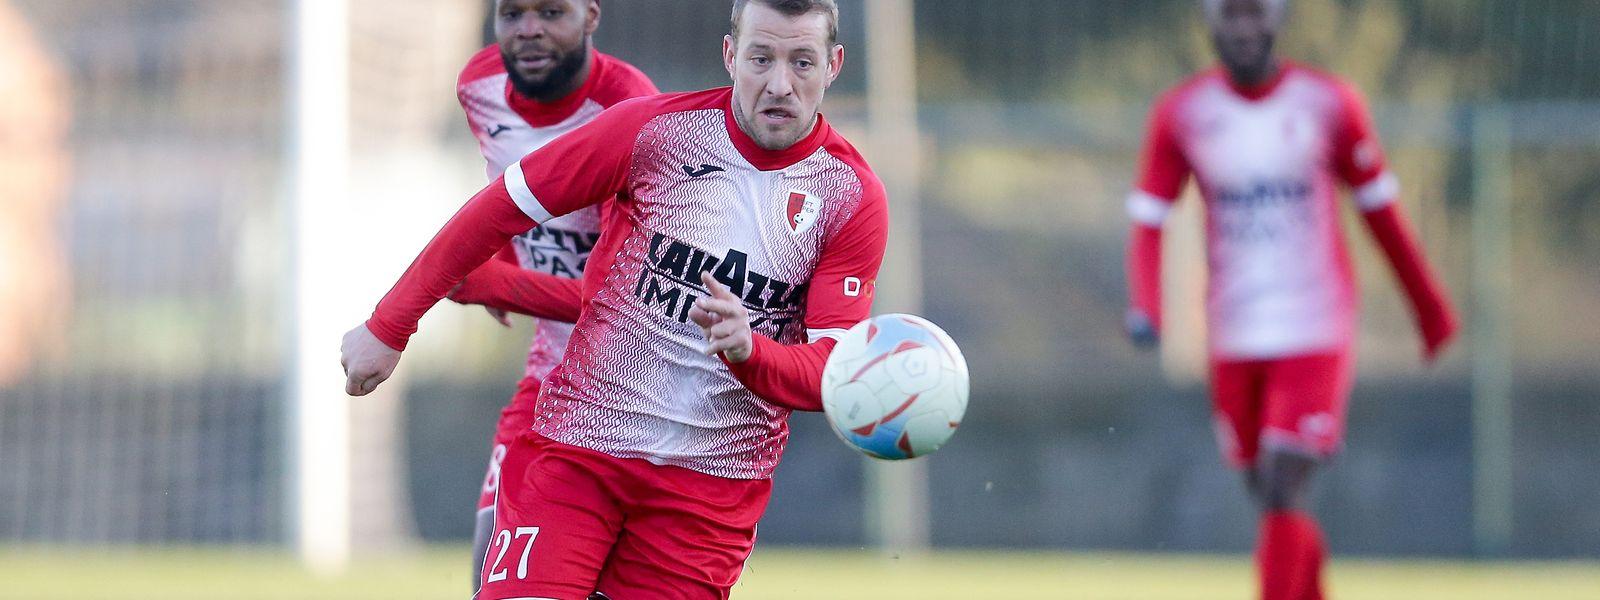 Hesperingen um Dominik Stolz gehört zu den stärksten Mannschaften in der BGL Ligue.